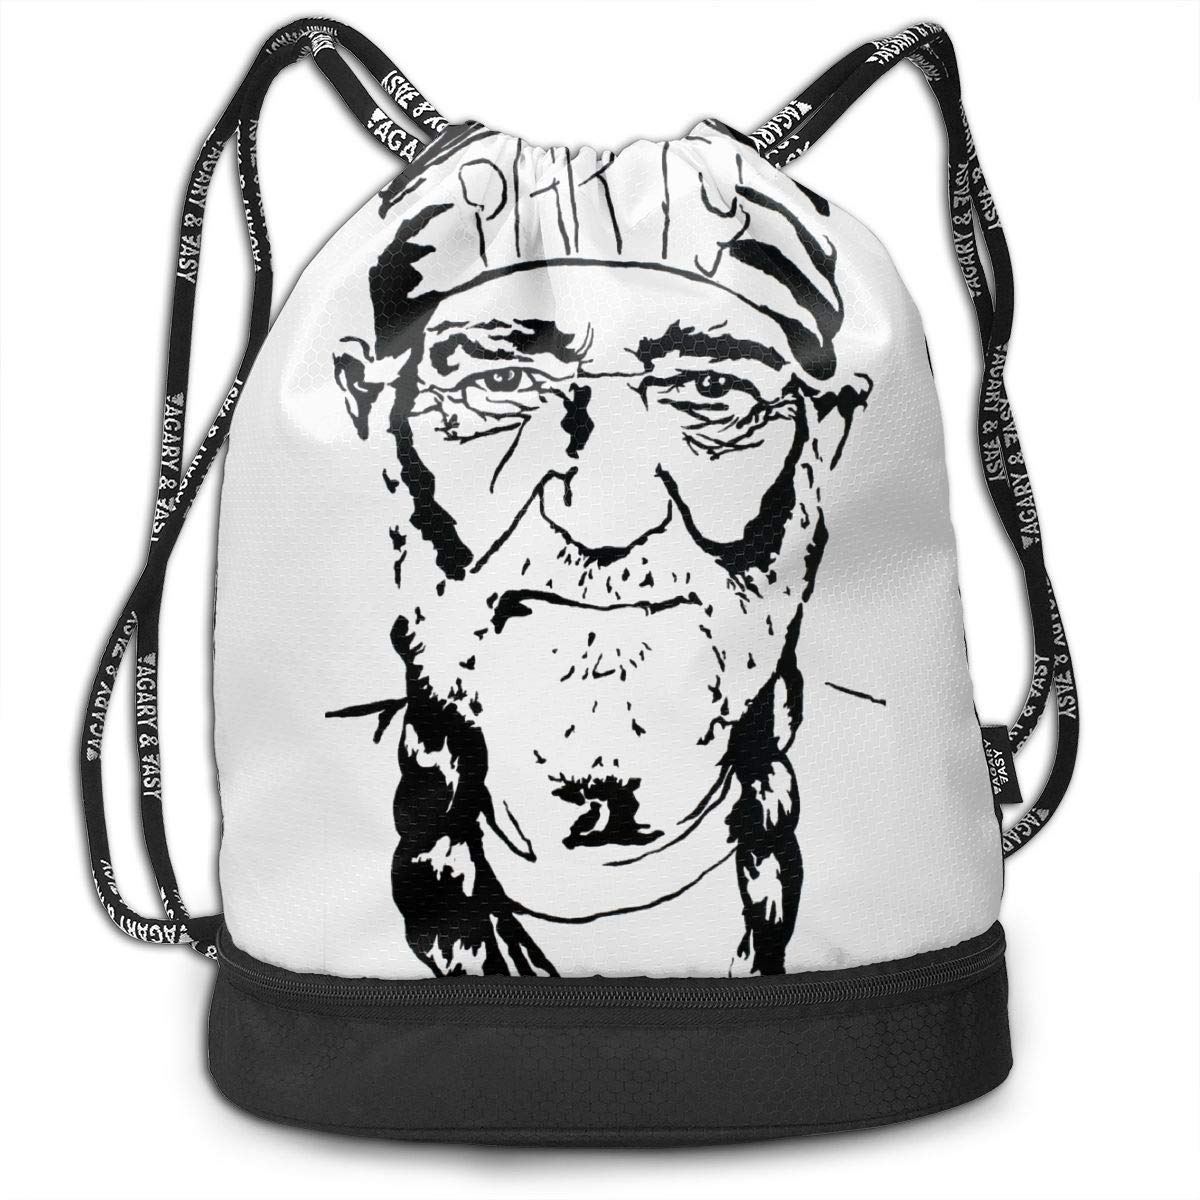 Chenjunyi Willie Nelson Drawstring Backpack Foldable Gym Tote Dance Bag for Swimming Shopping Sports Women Men Boys Girls